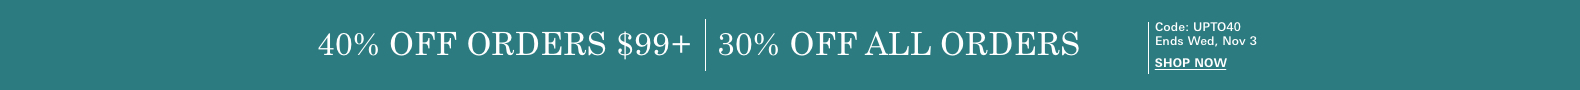 40% off orders $99+ | 30% off all orders, code: UPTO40, Ends Wed, Nov 3